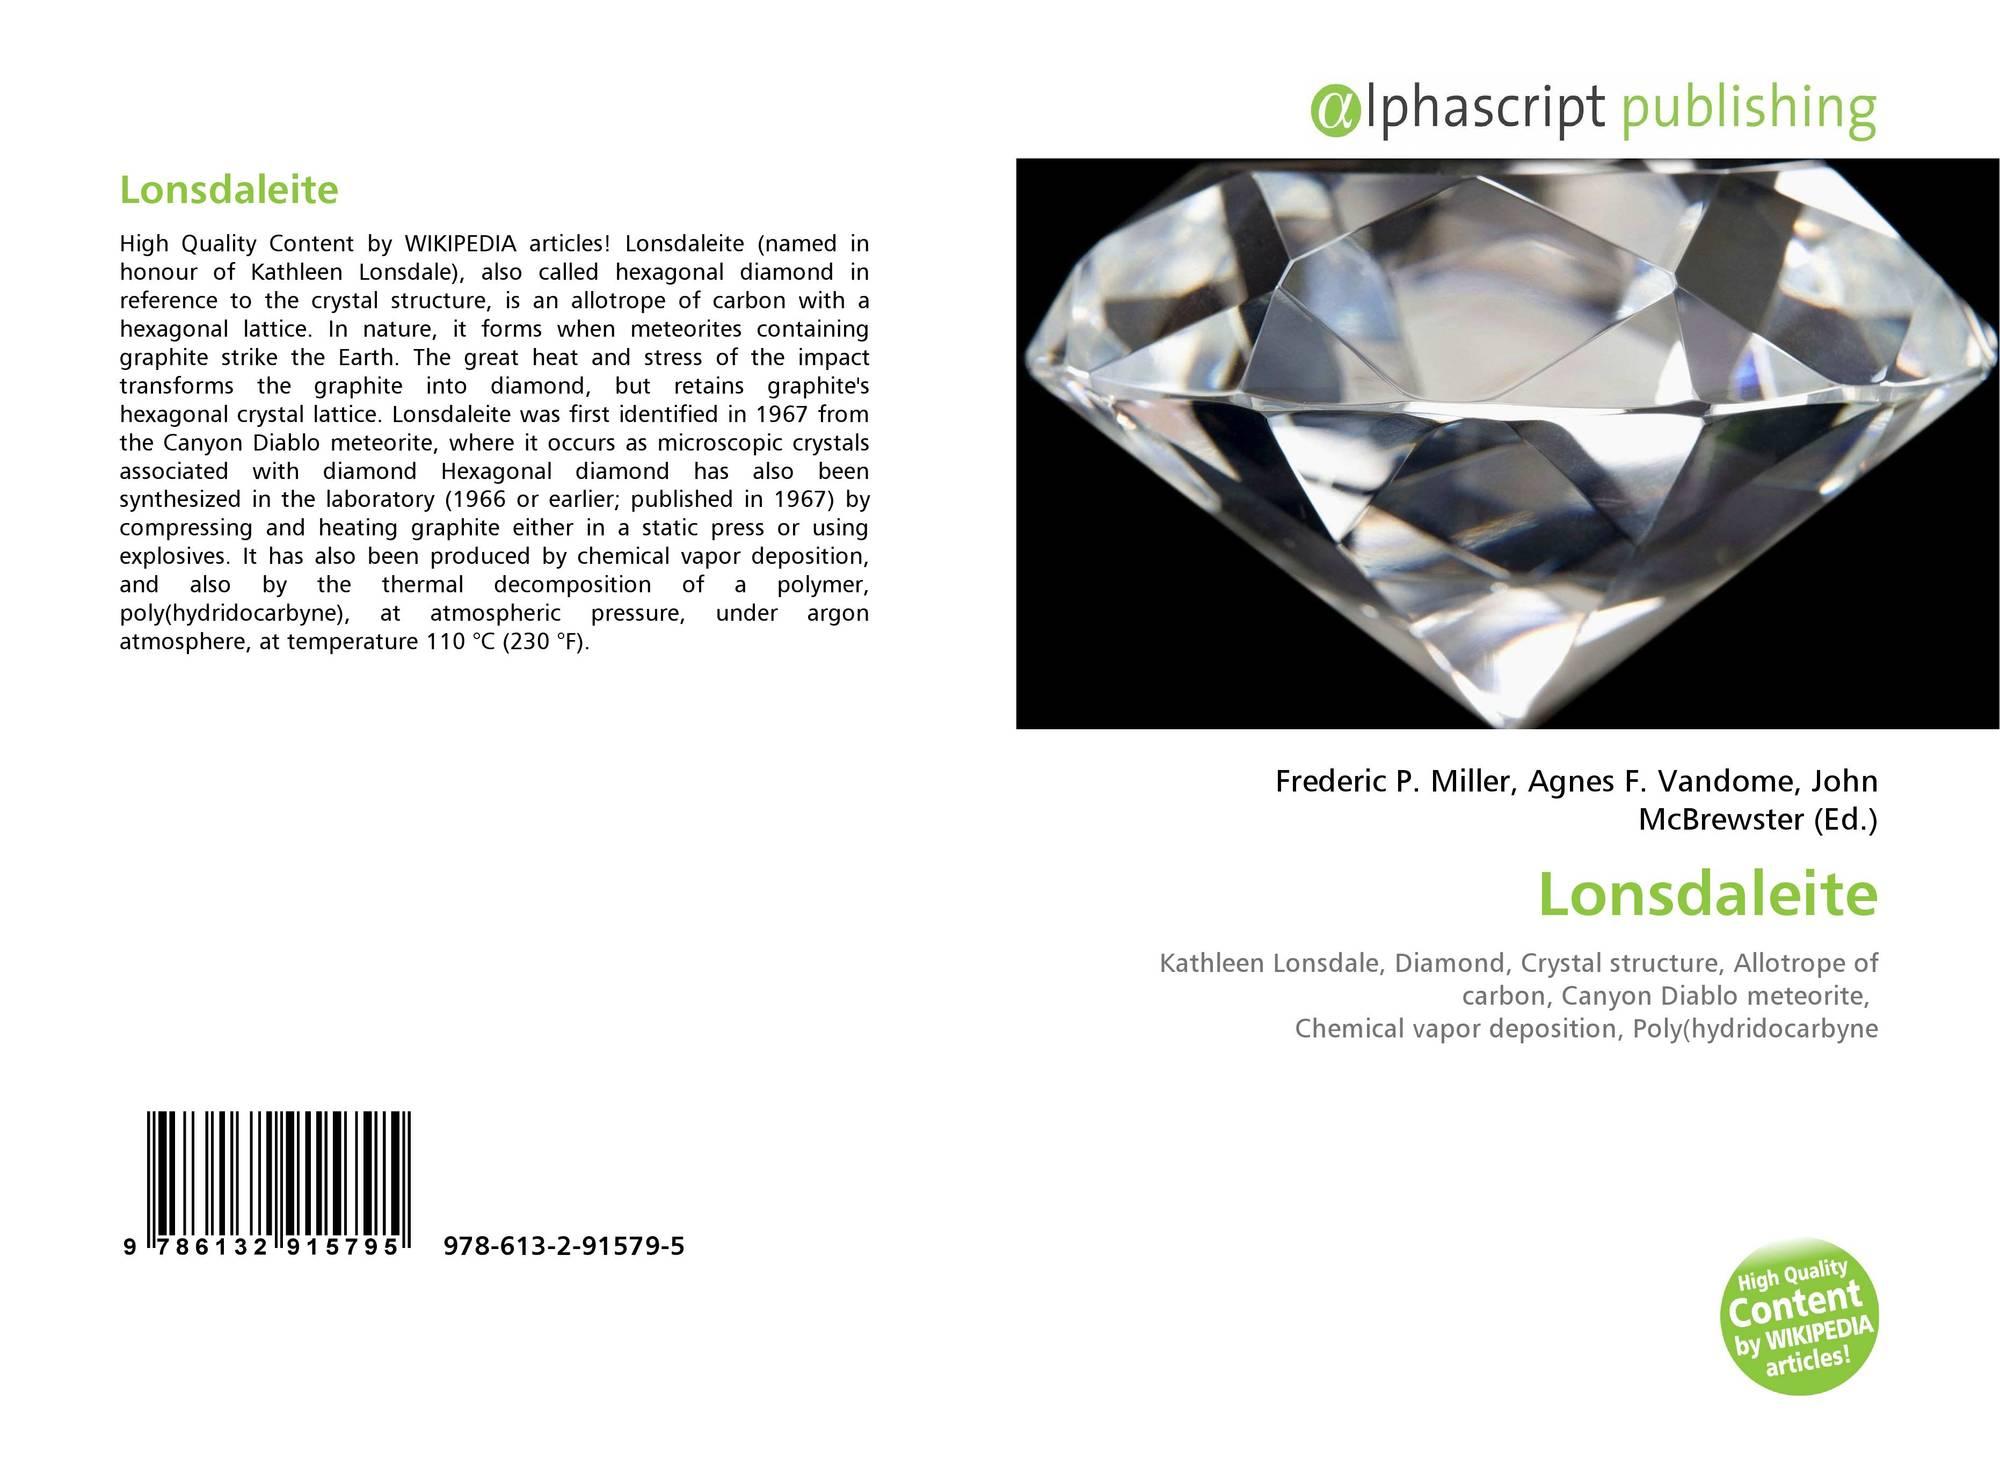 Lonsdaleite, 978-613-2-91579-5, 6132915796 ,9786132915795